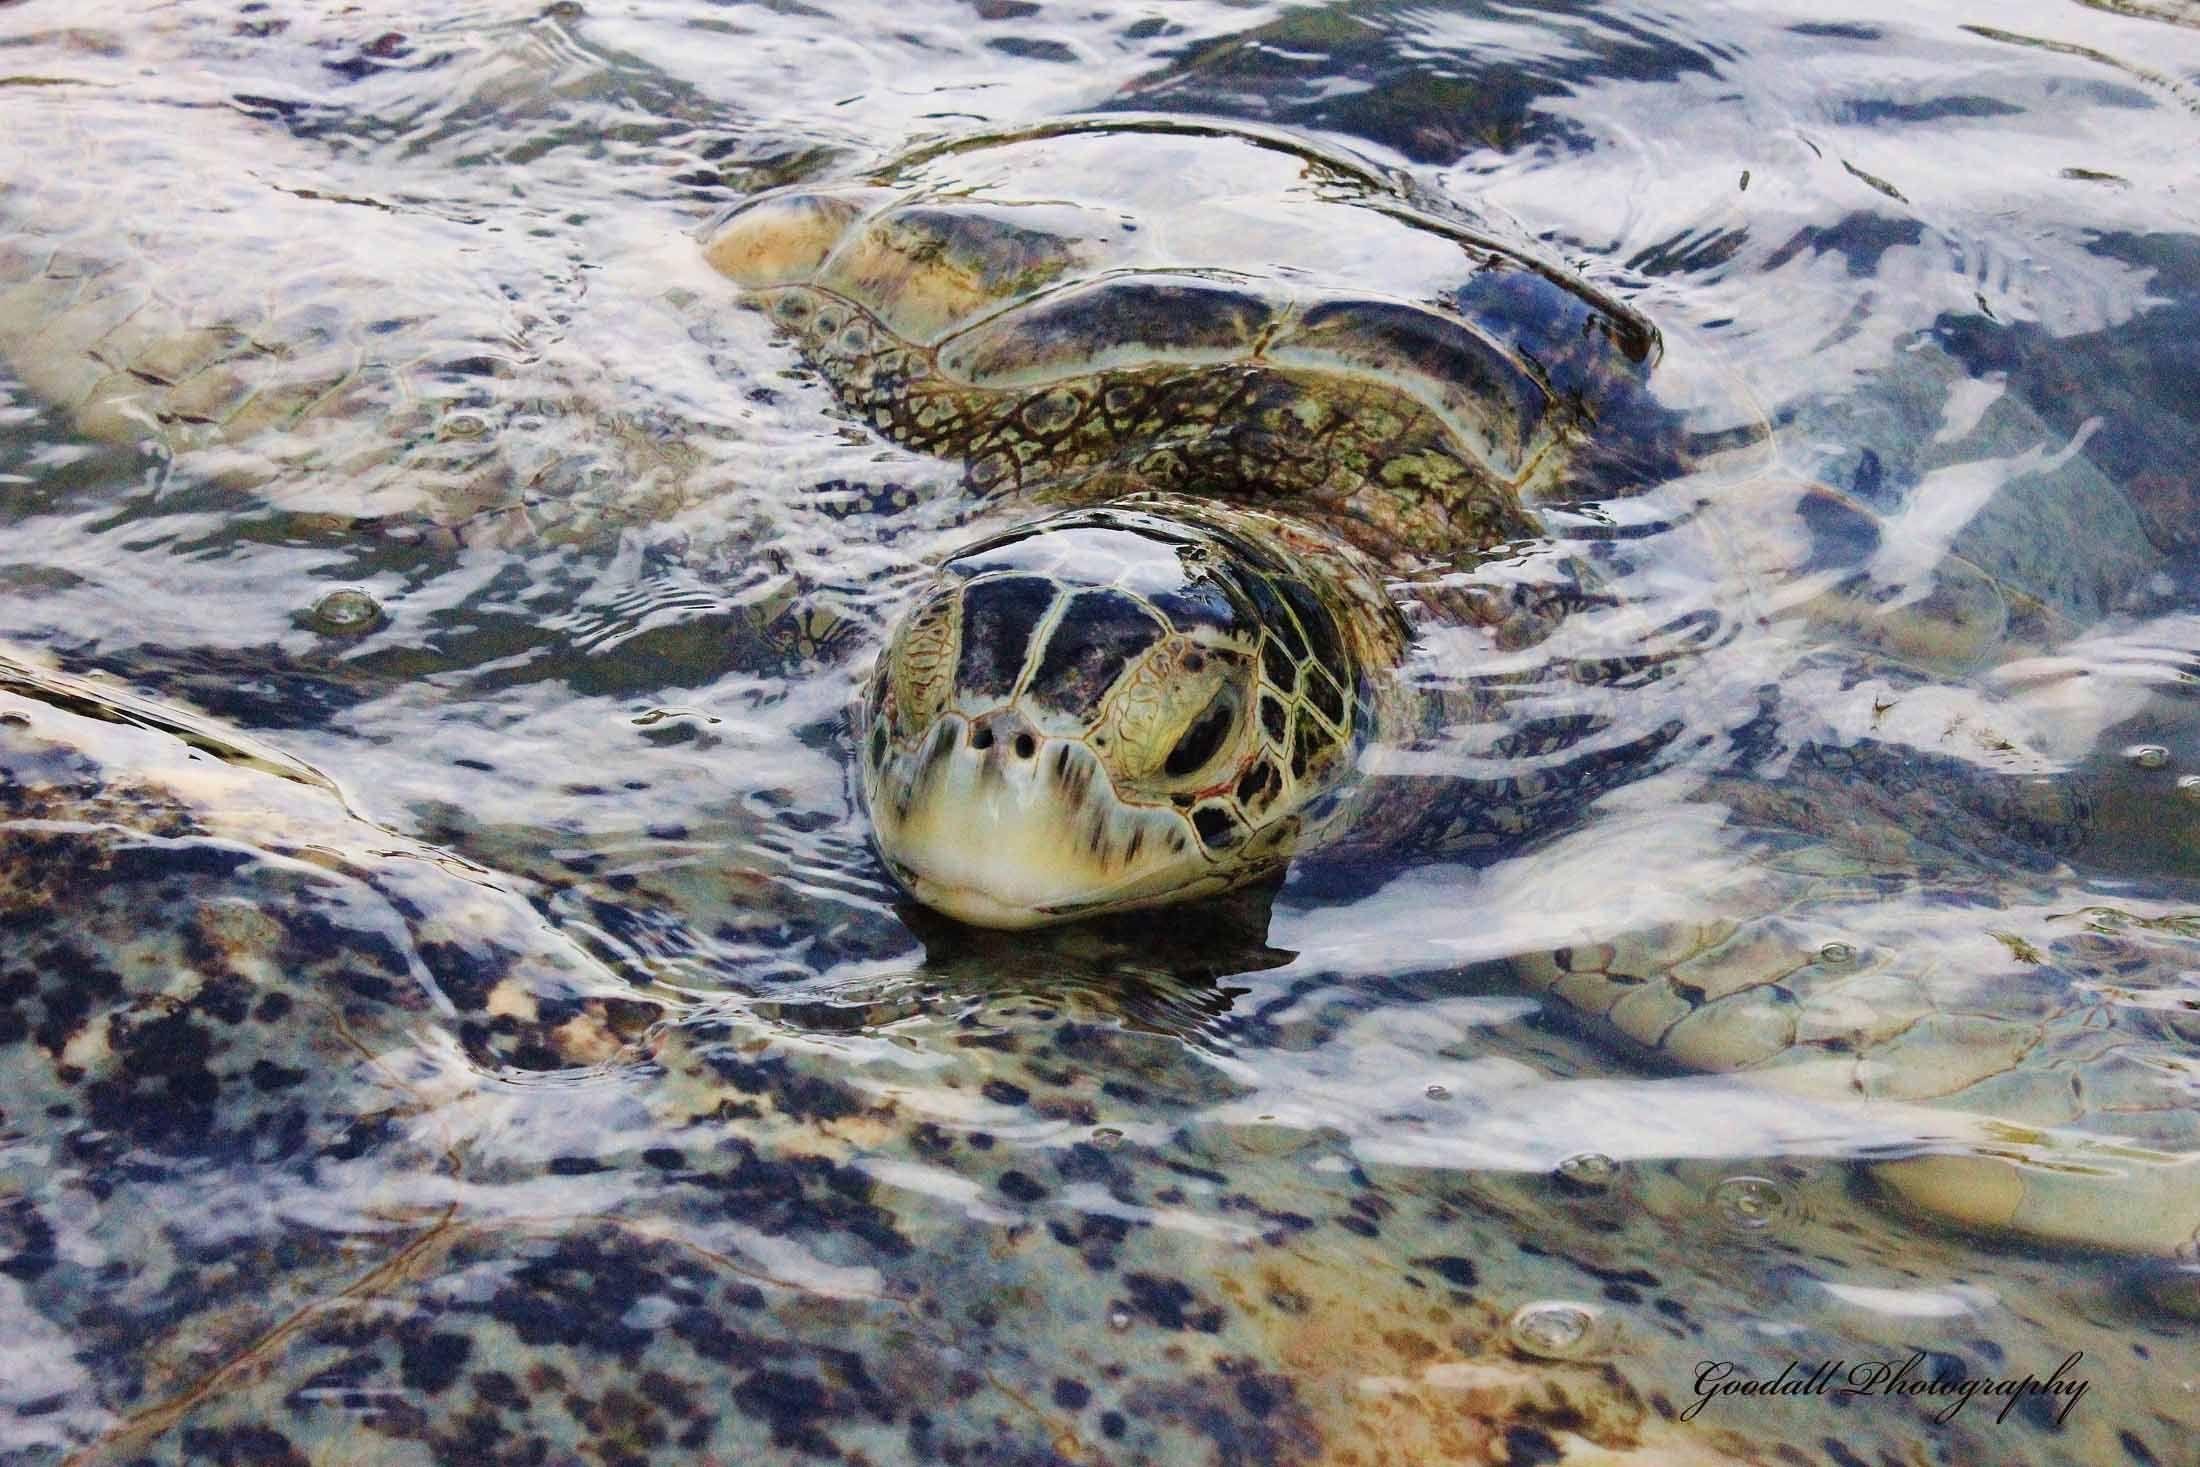 Green Sea Turtle / Cayman Turtle Farm / Grand Cayman Island / June 2013 https://www.facebook.com/goodallphoto